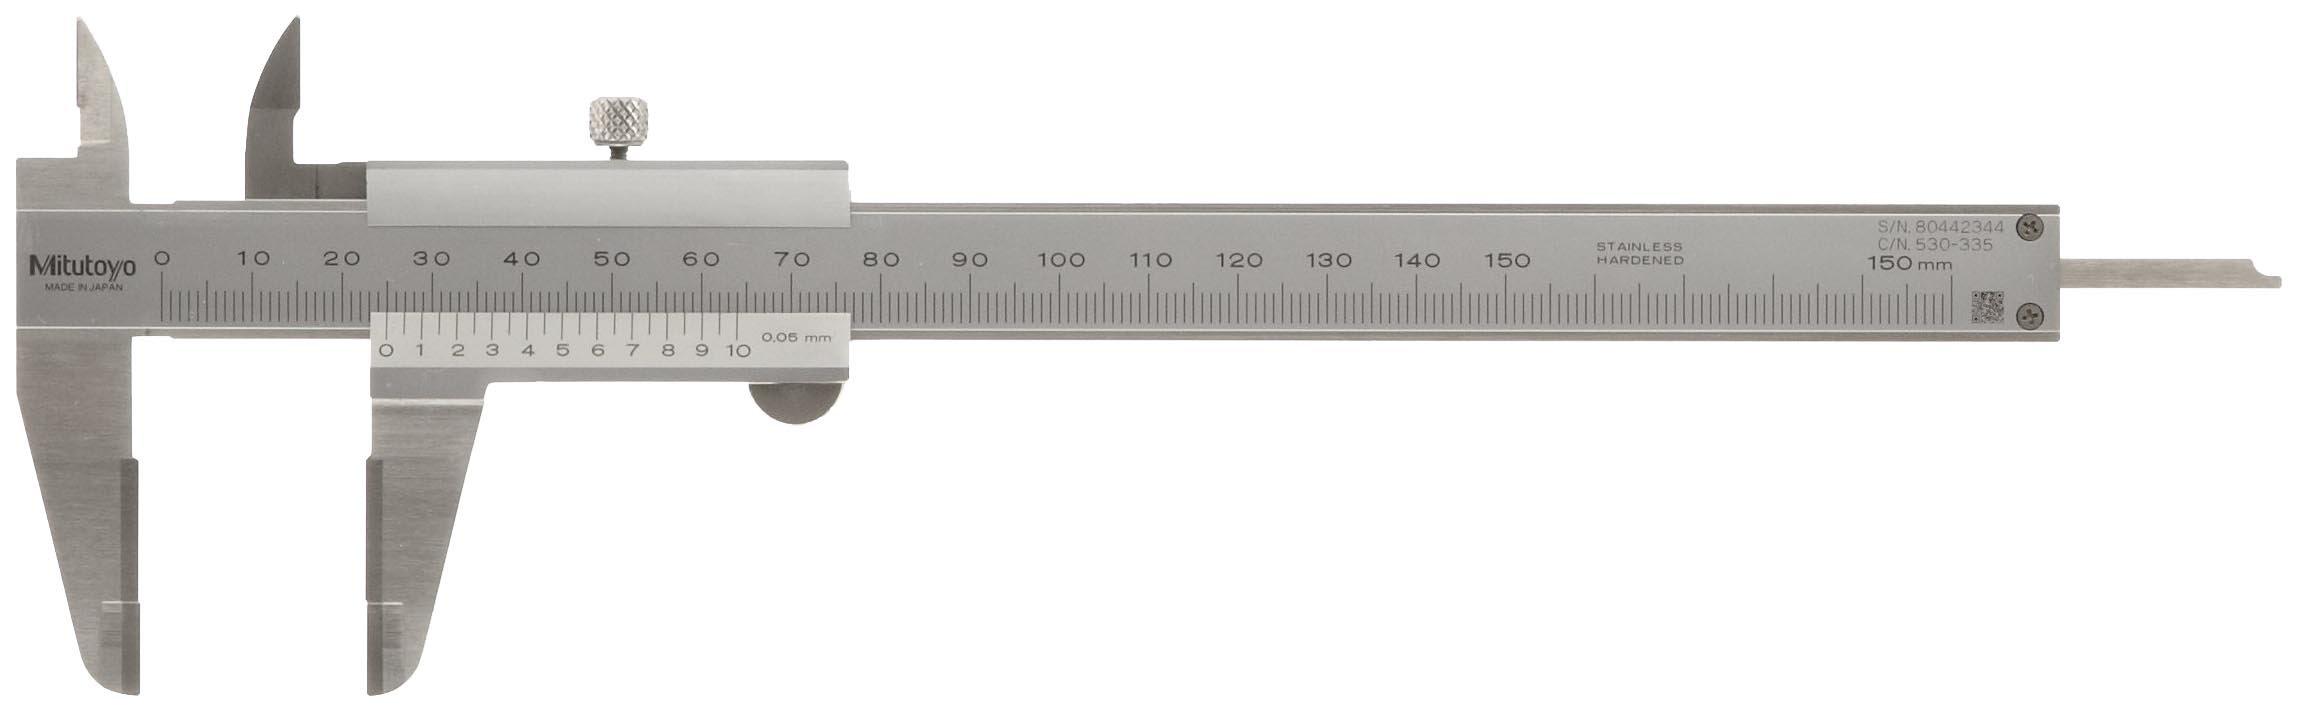 Thickness of tooth measured using digital vernier caliper.